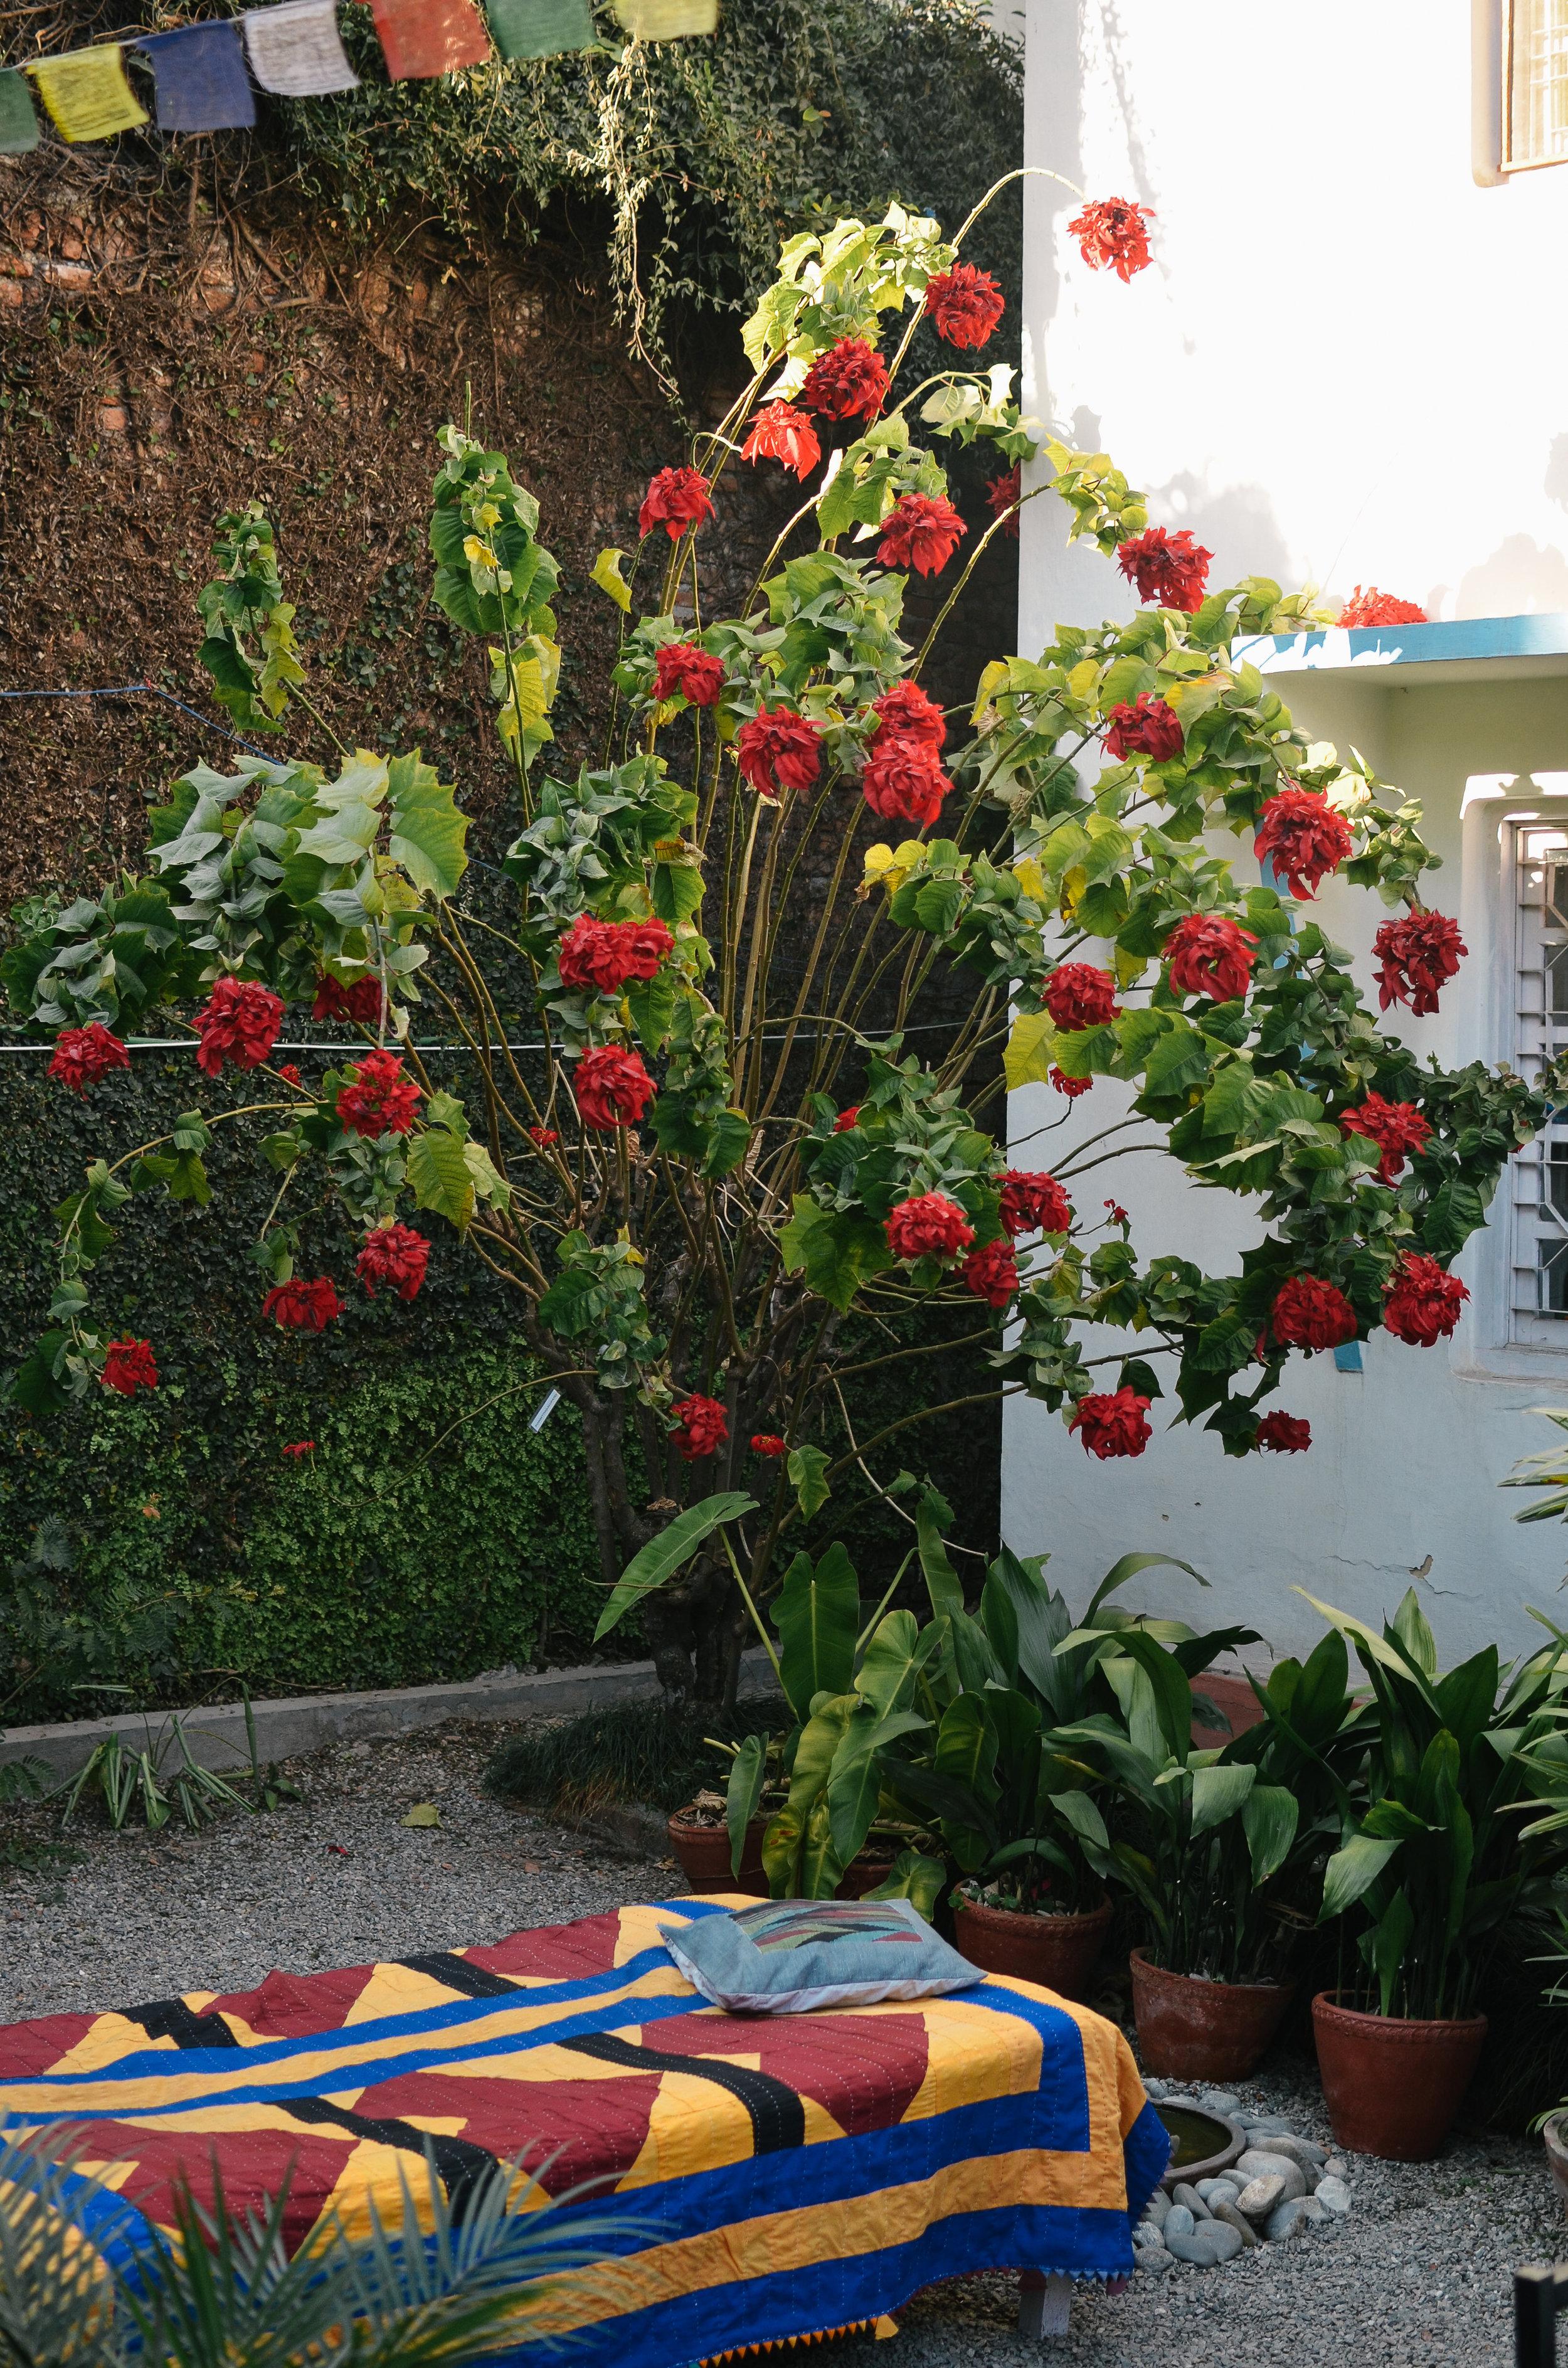 10-things-to-know-kathmandu-nepal-lifeonpine_DSC_0556.jpg